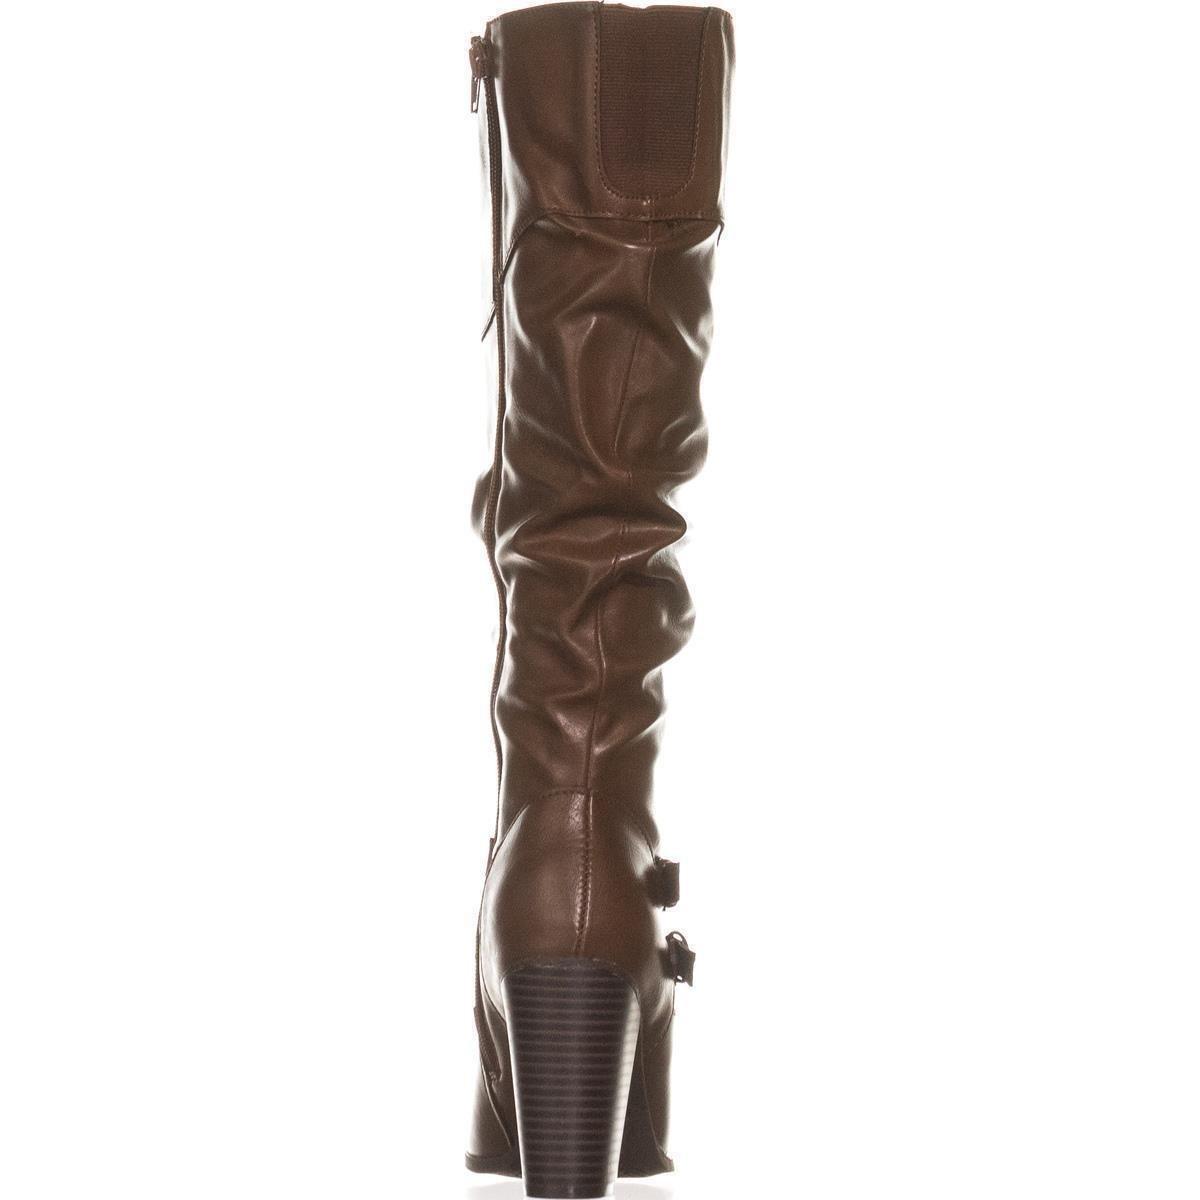 Style & Co. Frauen Sophllep wc Geschlossener Zeh Zeh Zeh Fashion Stiefel 440d78